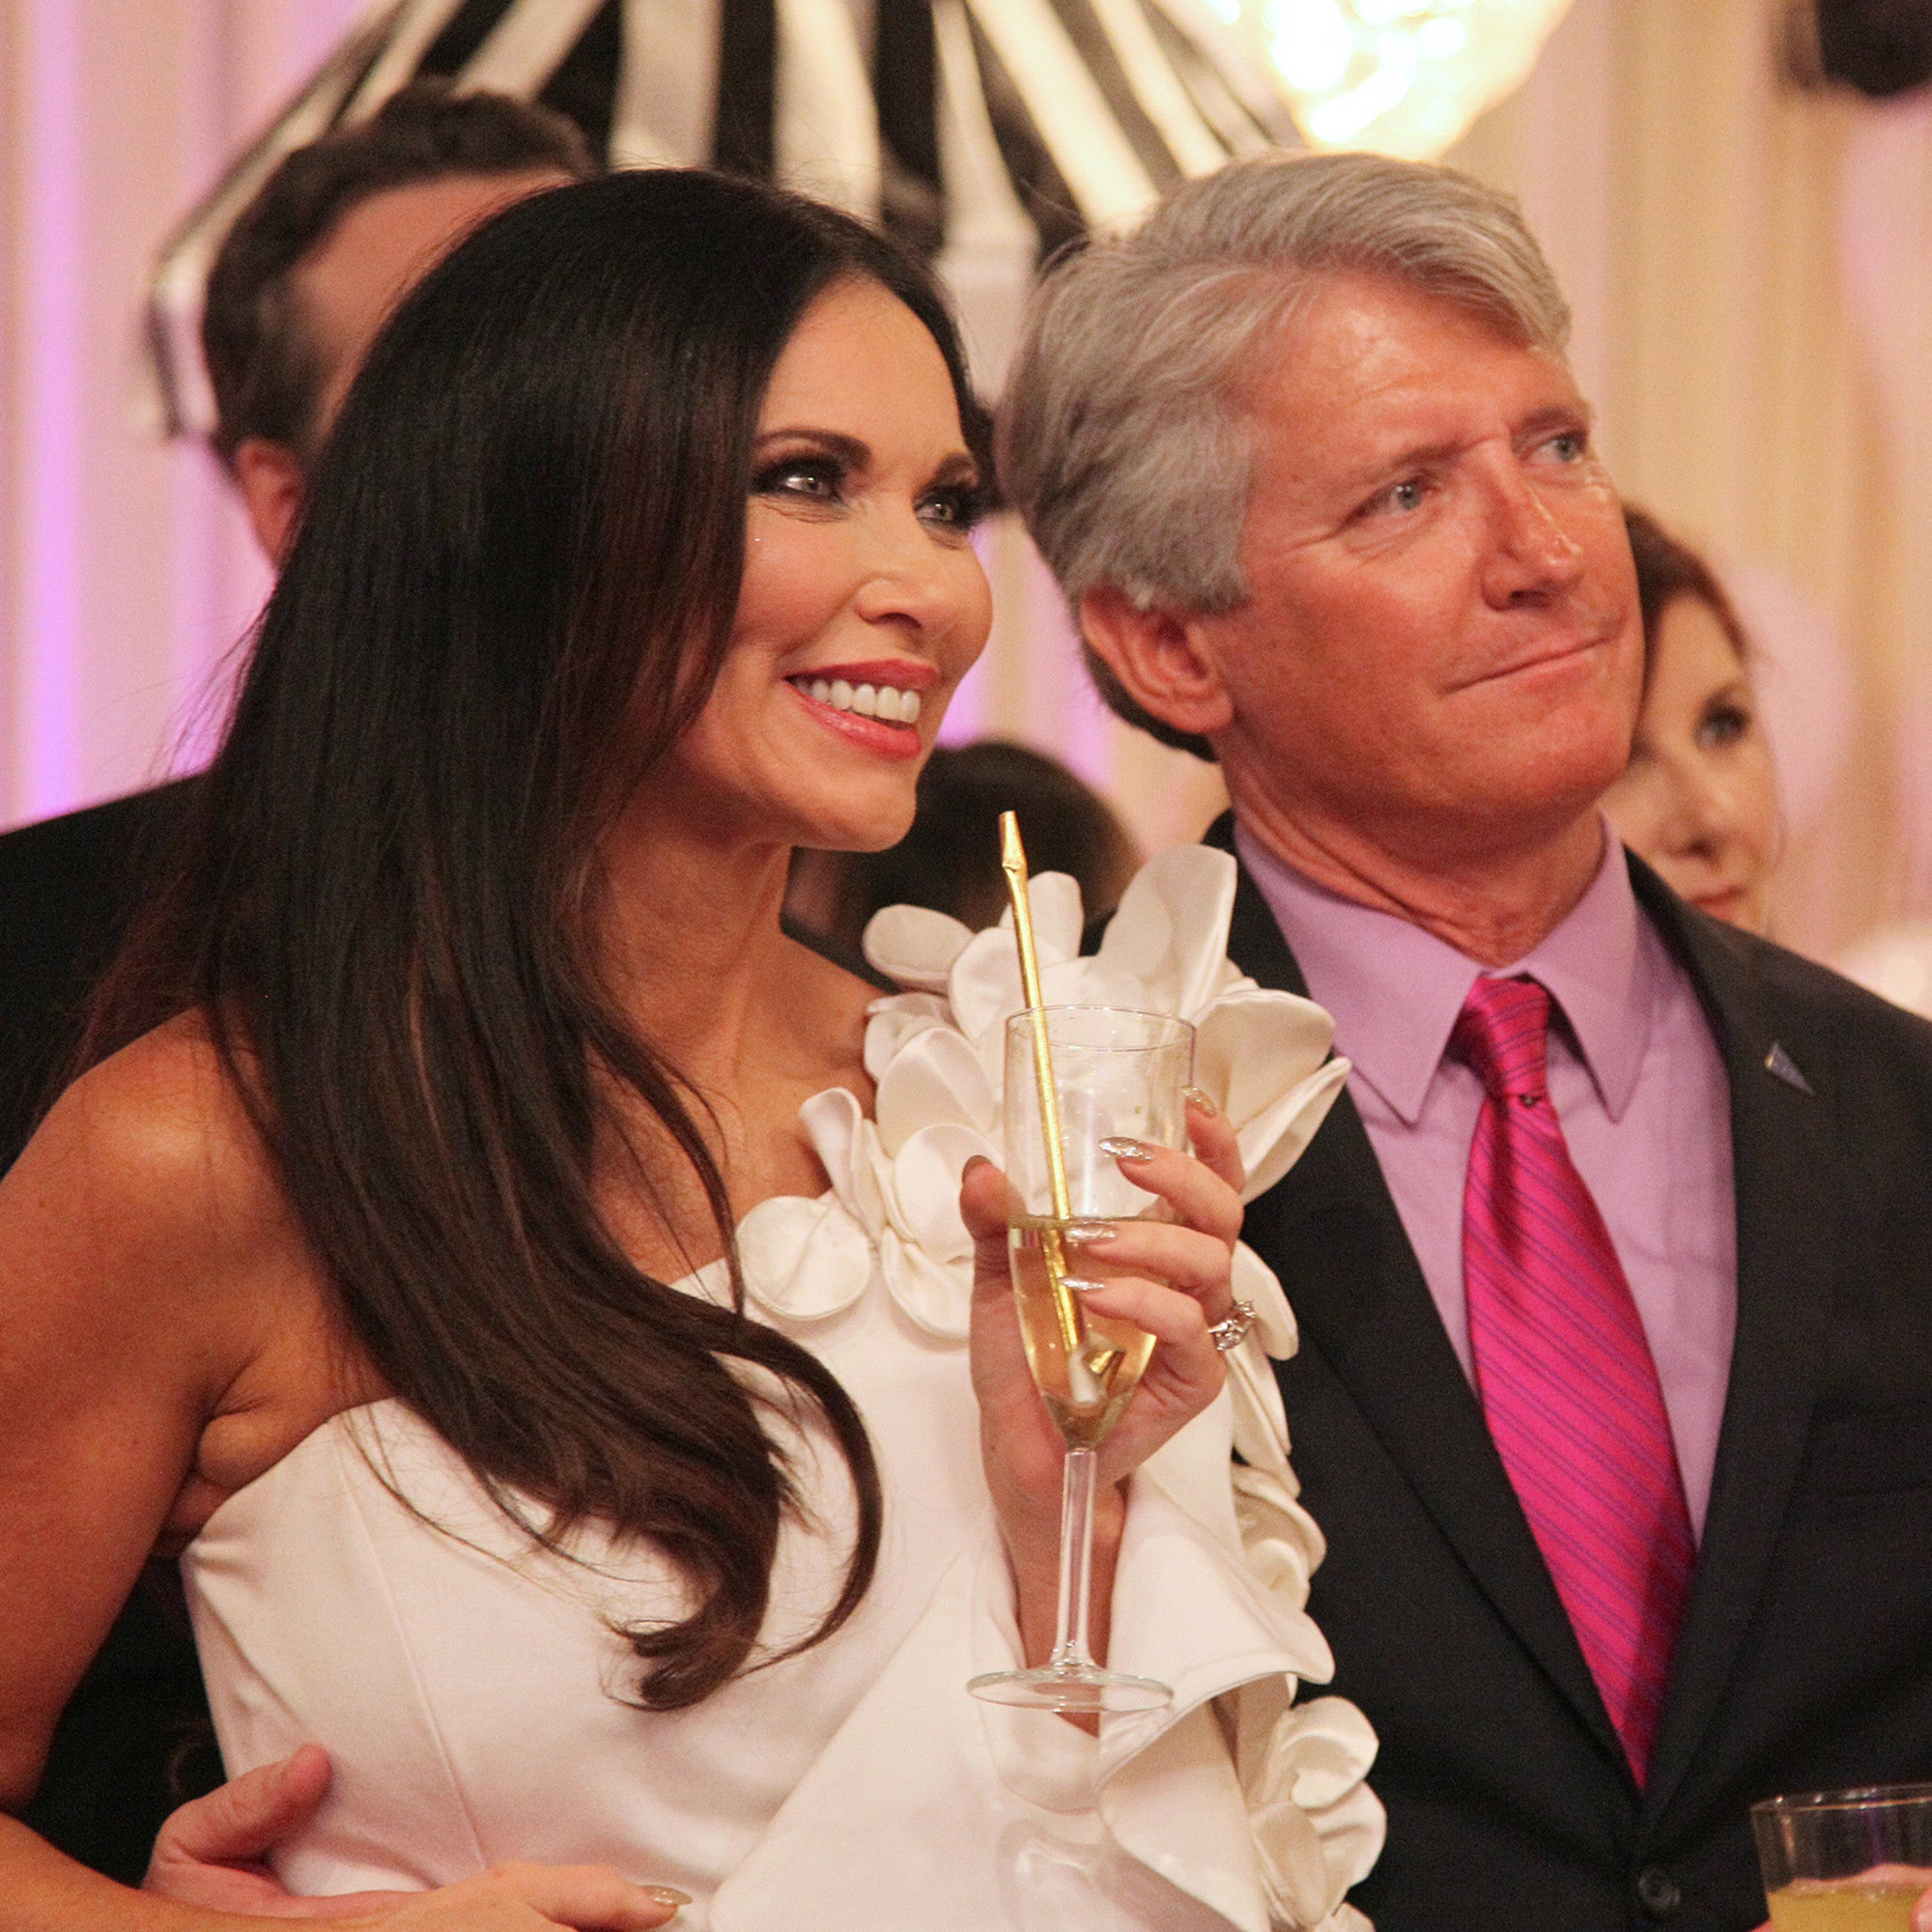 Rich Emberlin, LeeAnne Locken's New Husband From RHOD, Has Done Reality TV Before